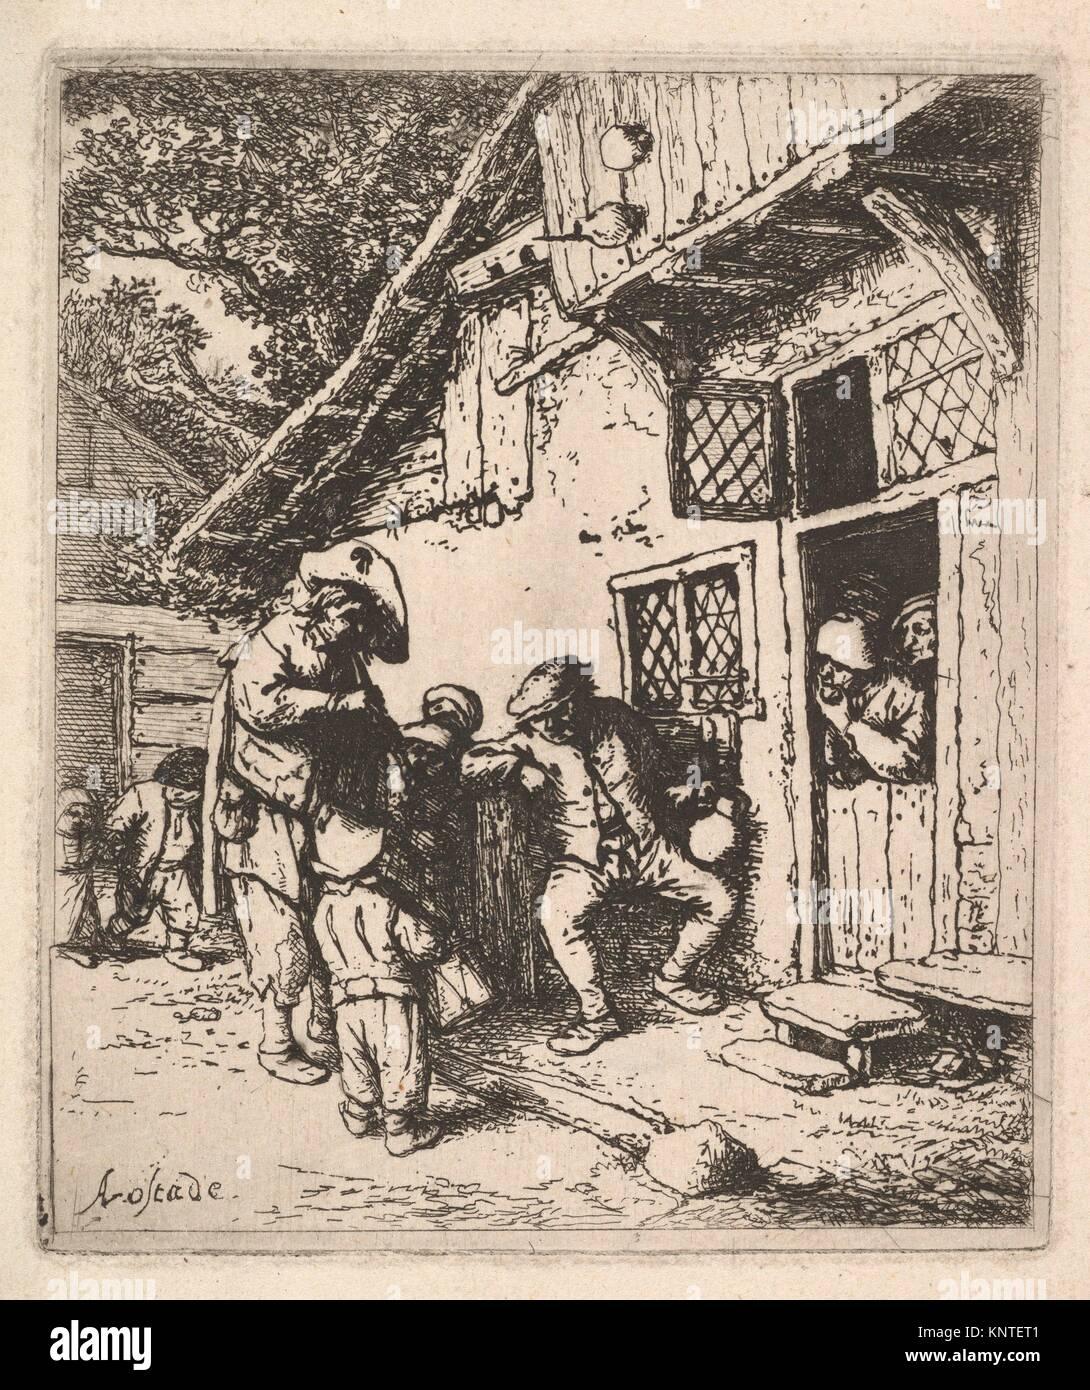 Traveling Musicians. Artist: Adriaen van Ostade (Dutch, Haarlem 1610-1685 Haarlem); Date: 1610-85; Medium: Etching; Stock Photo